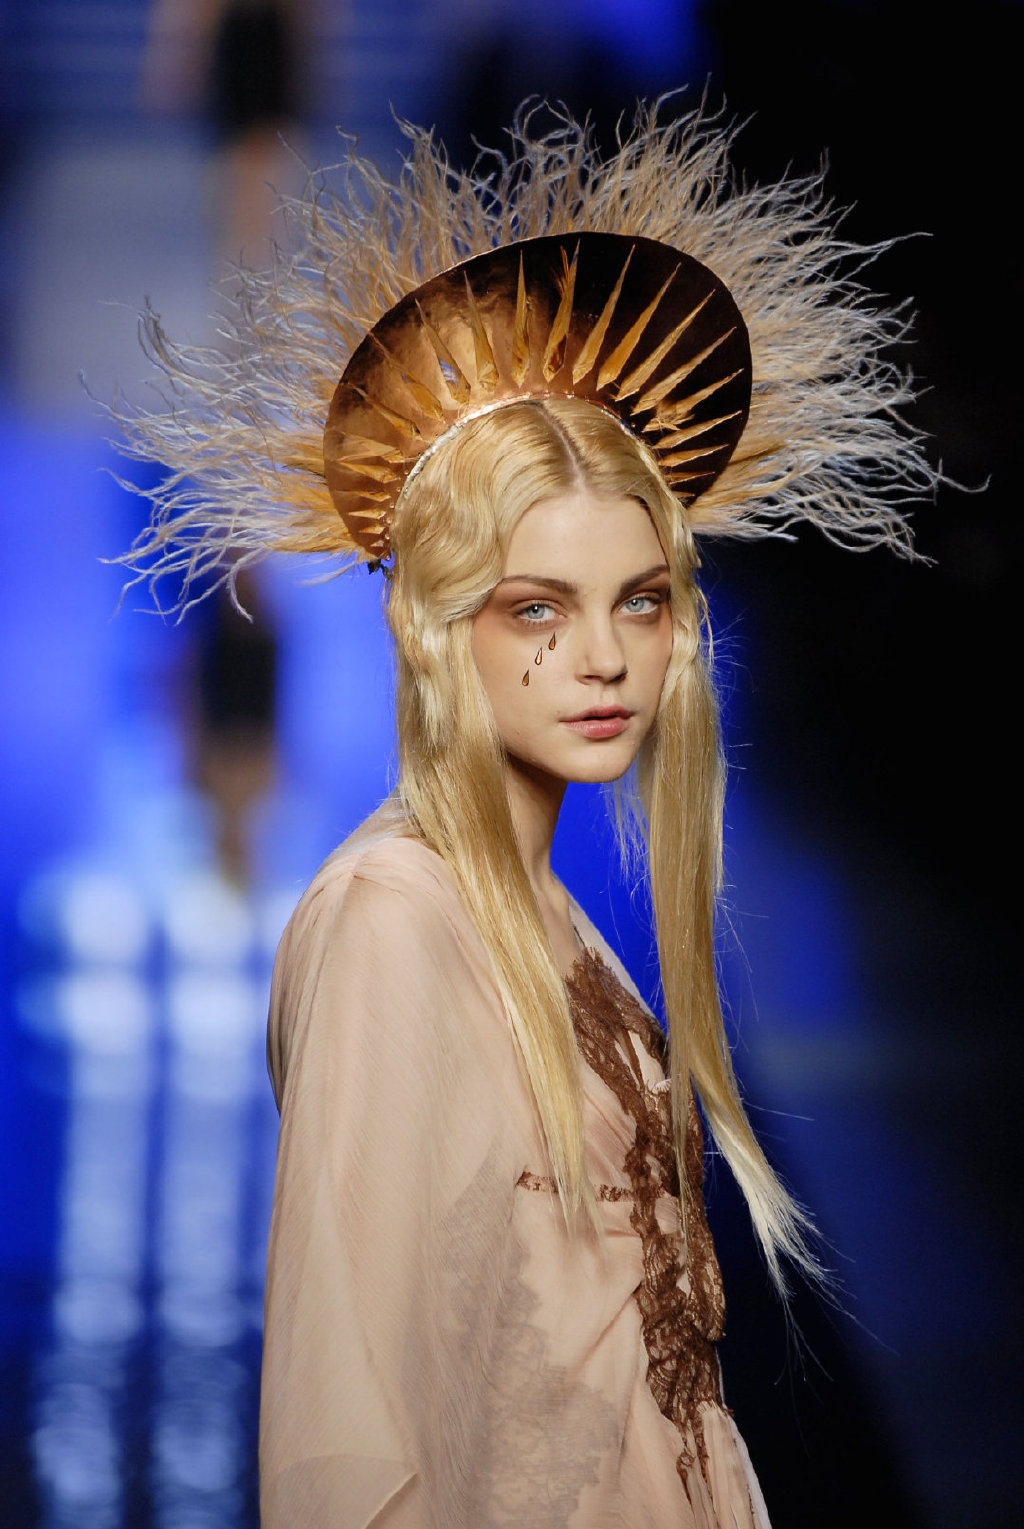 太阳泪 Jessica Stam 丨Jean Paul Gaultier 07SS